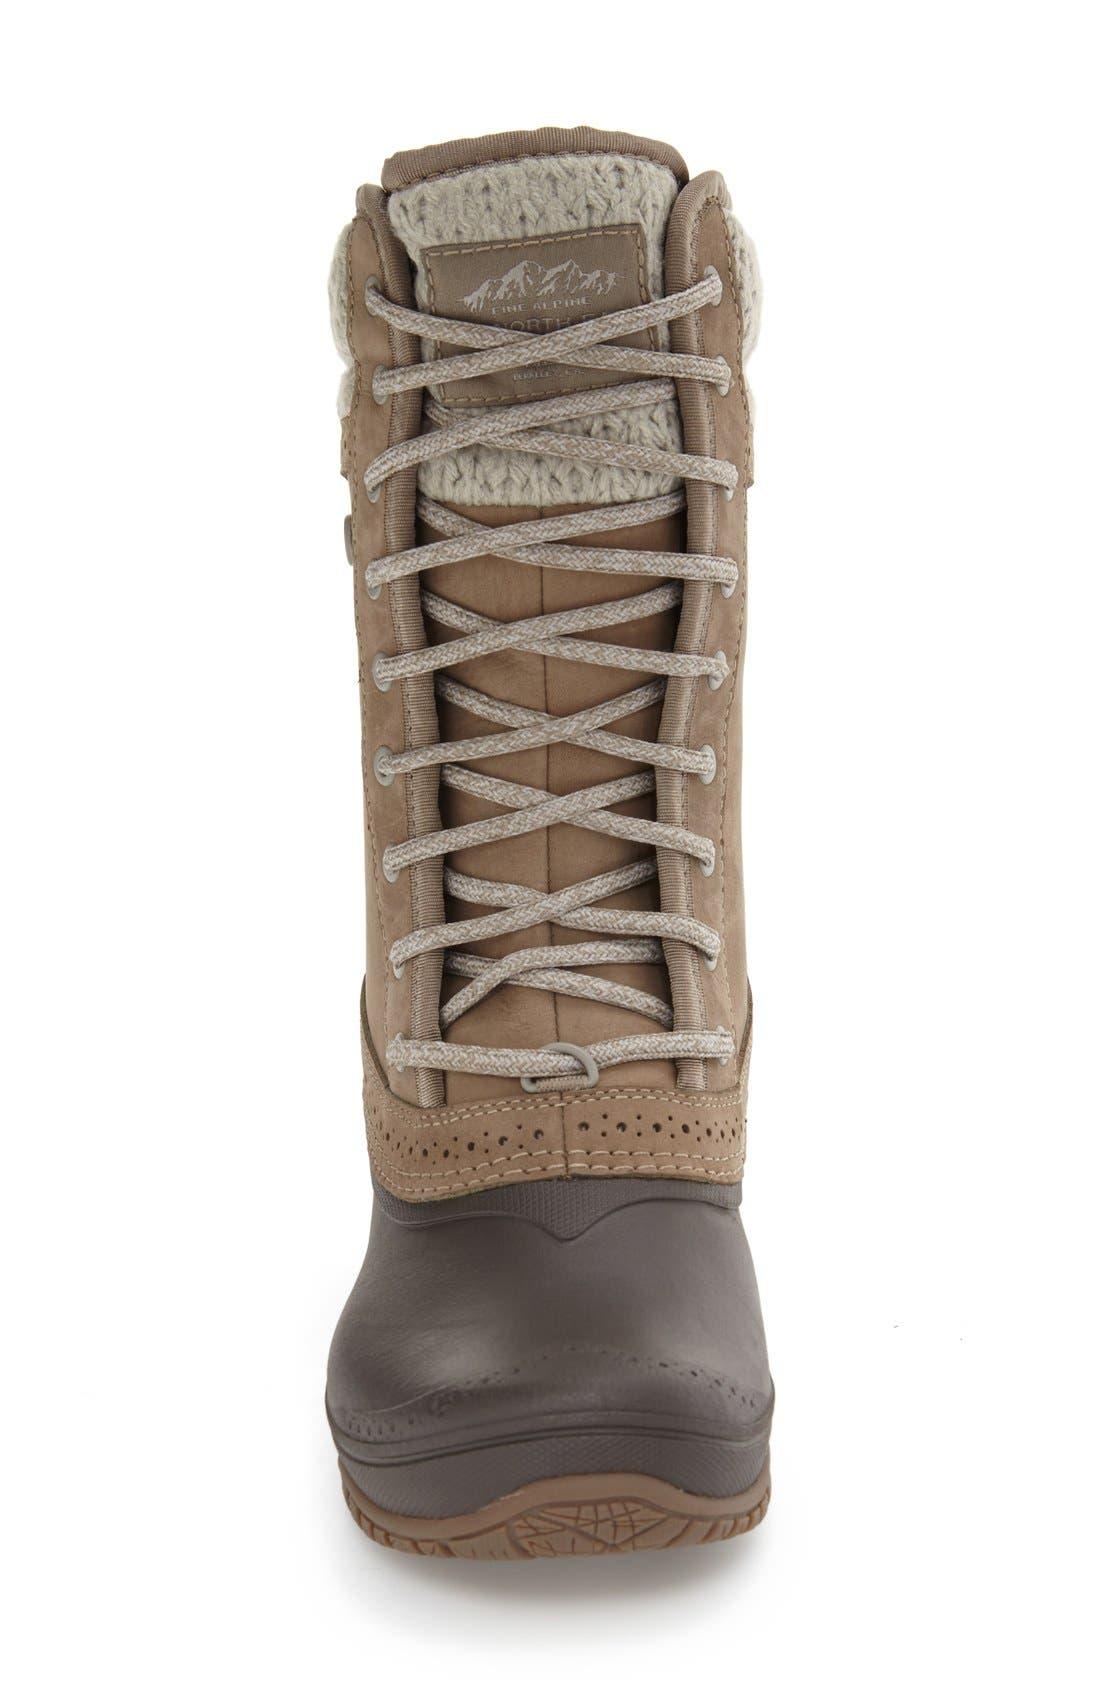 Shellista Waterproof Insulated Snow Boot,                             Alternate thumbnail 3, color,                             Split Rock Brown/ Dove Grey